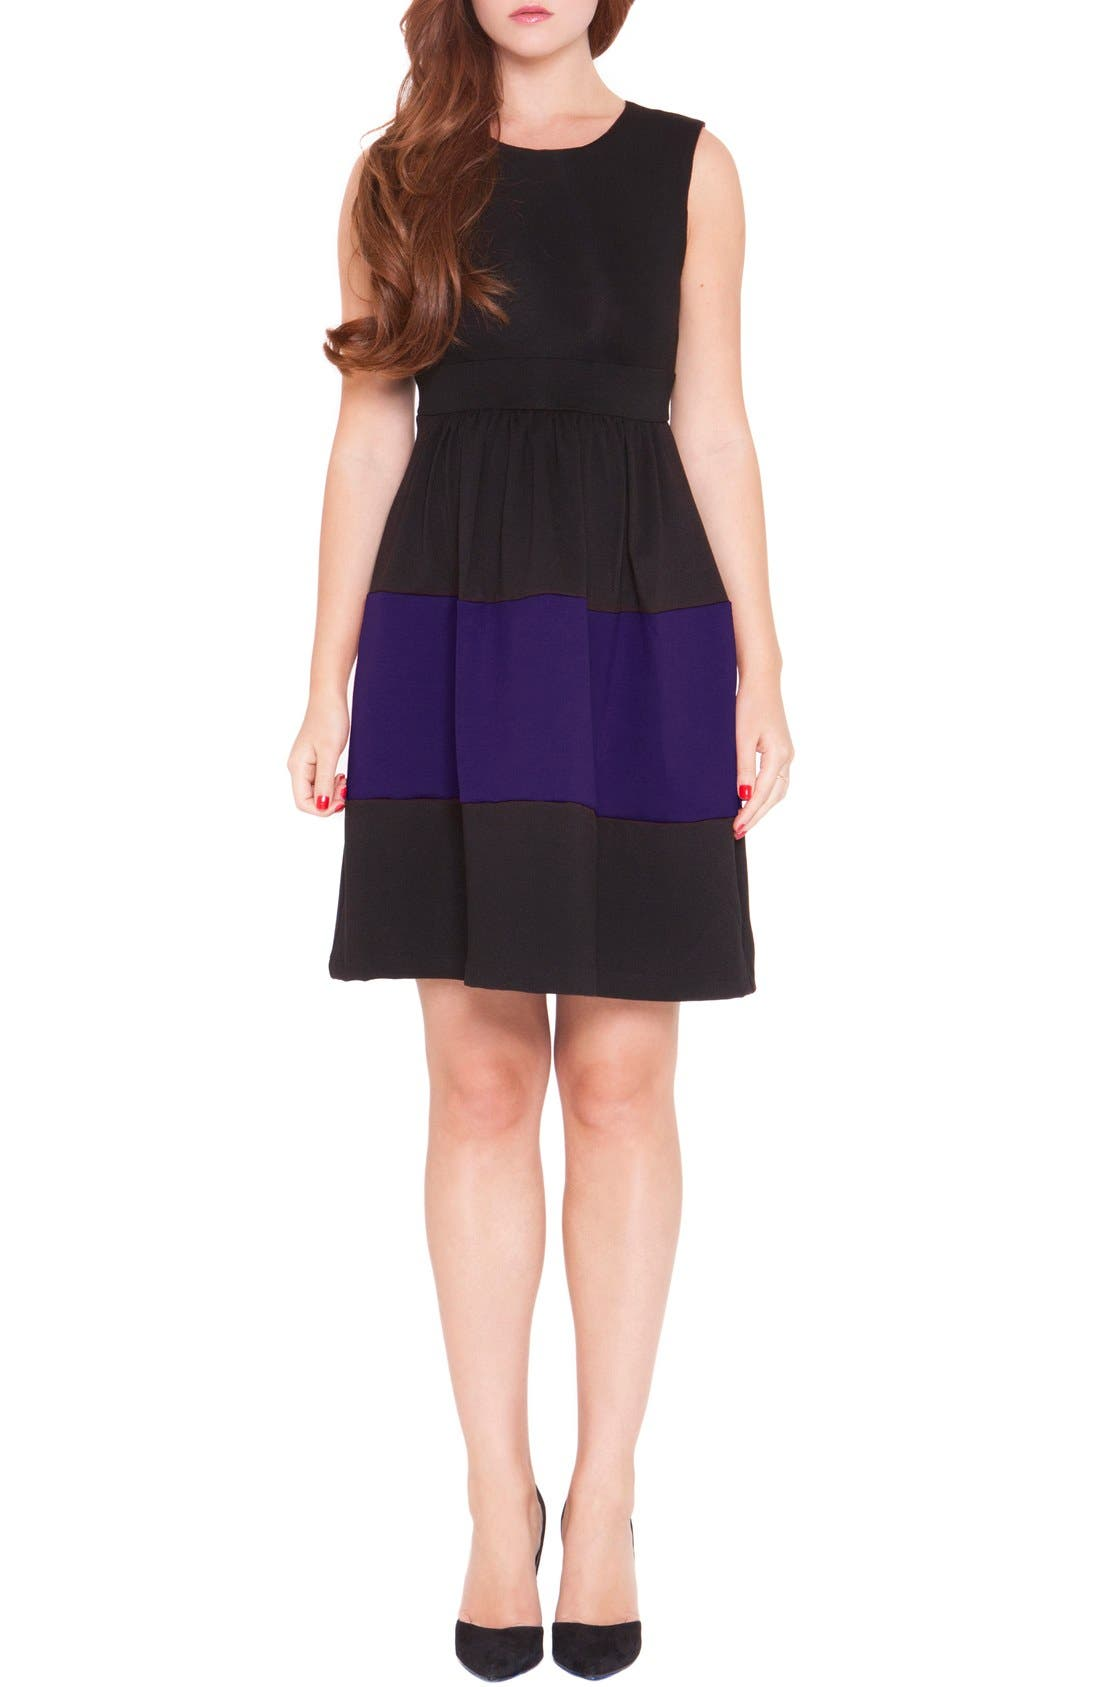 OLIAN 'Caroline' ColorblockMaternity Dress